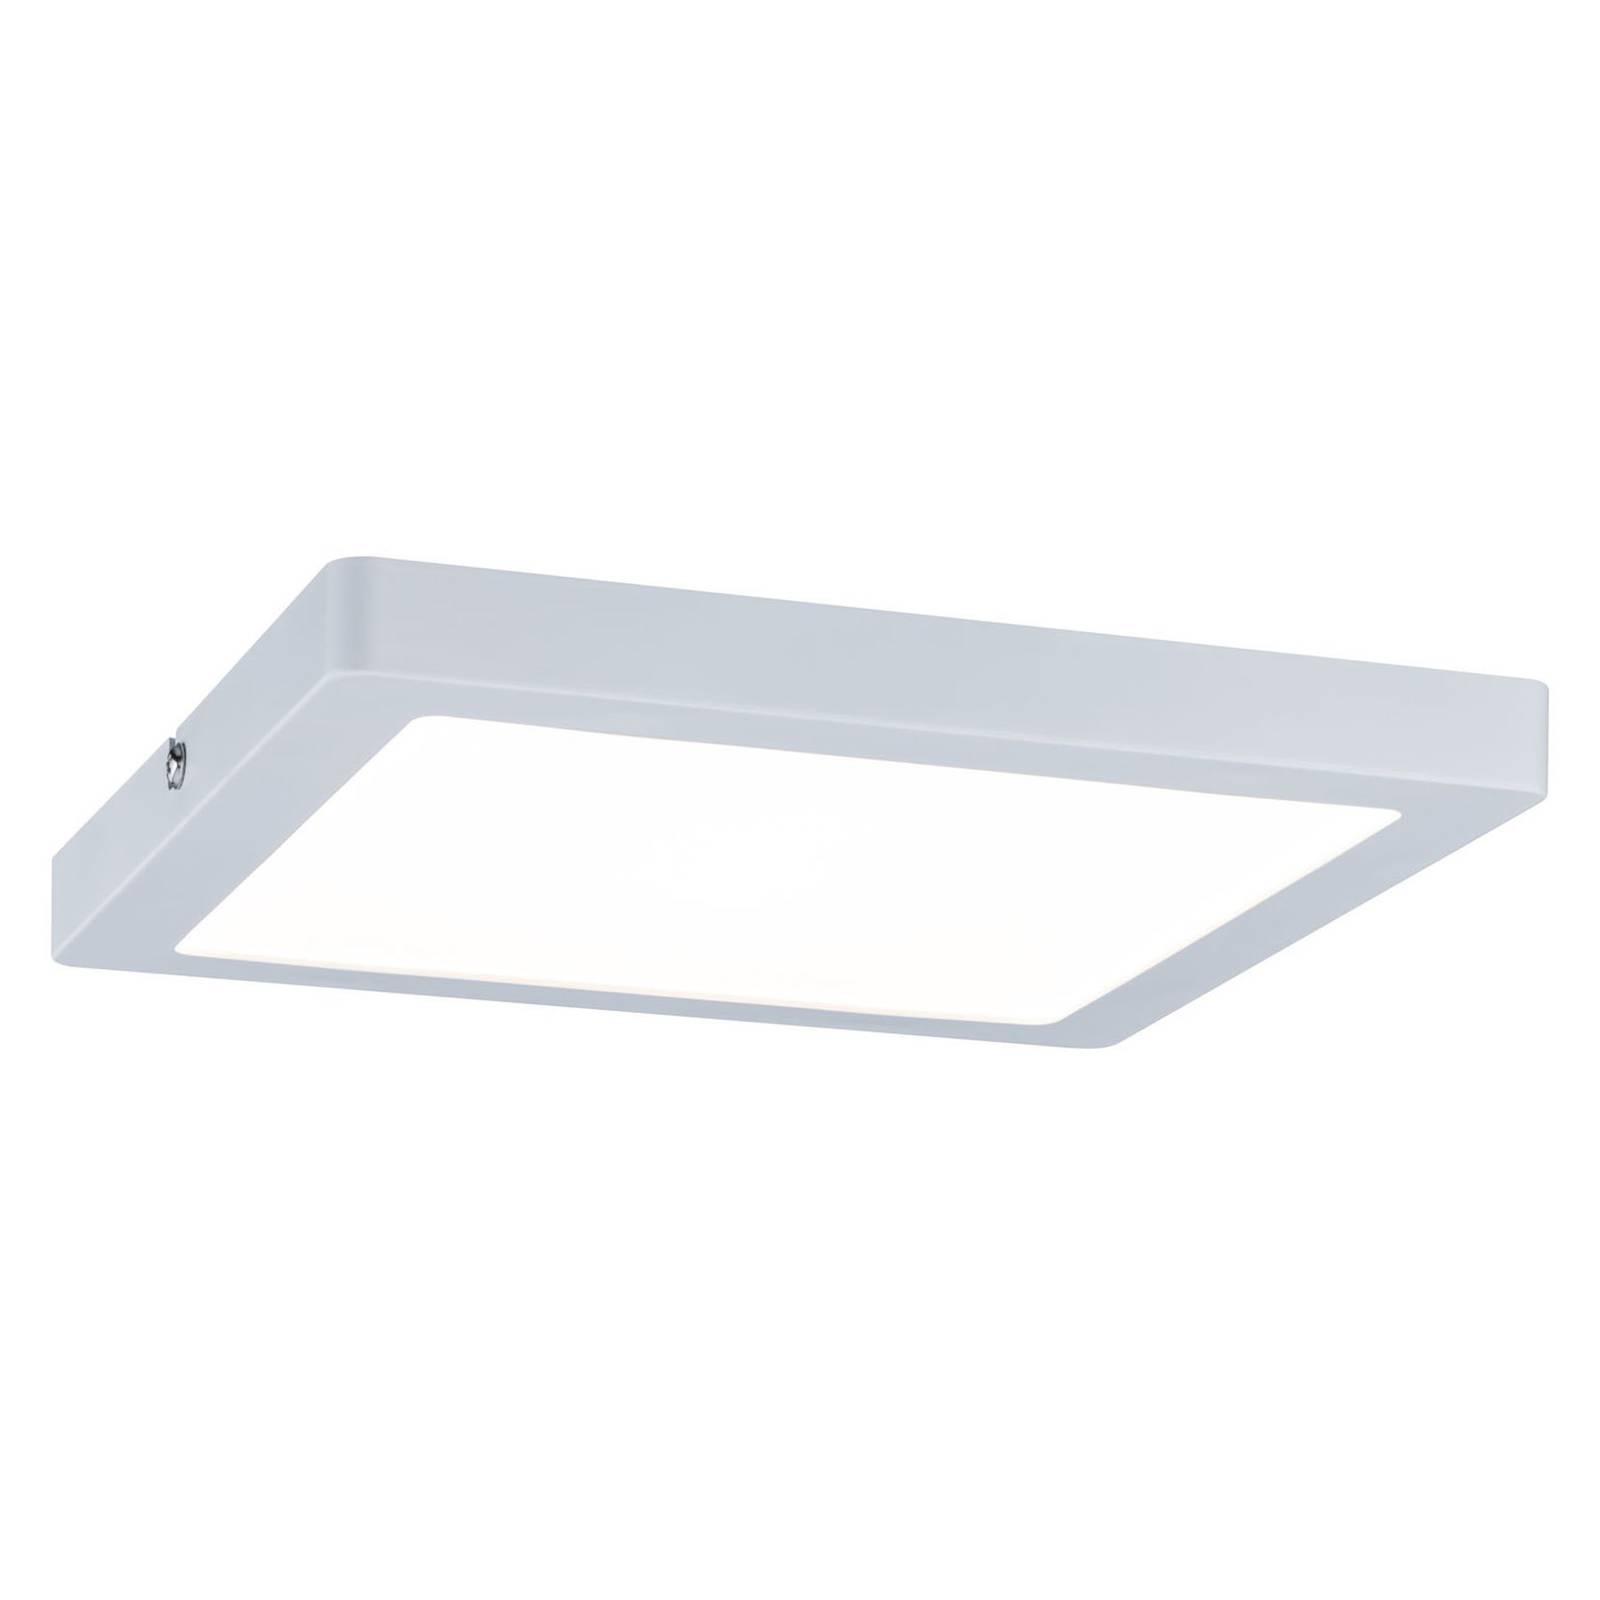 Paulmann Atria LED plafondlamp 22x22 cm wit mat